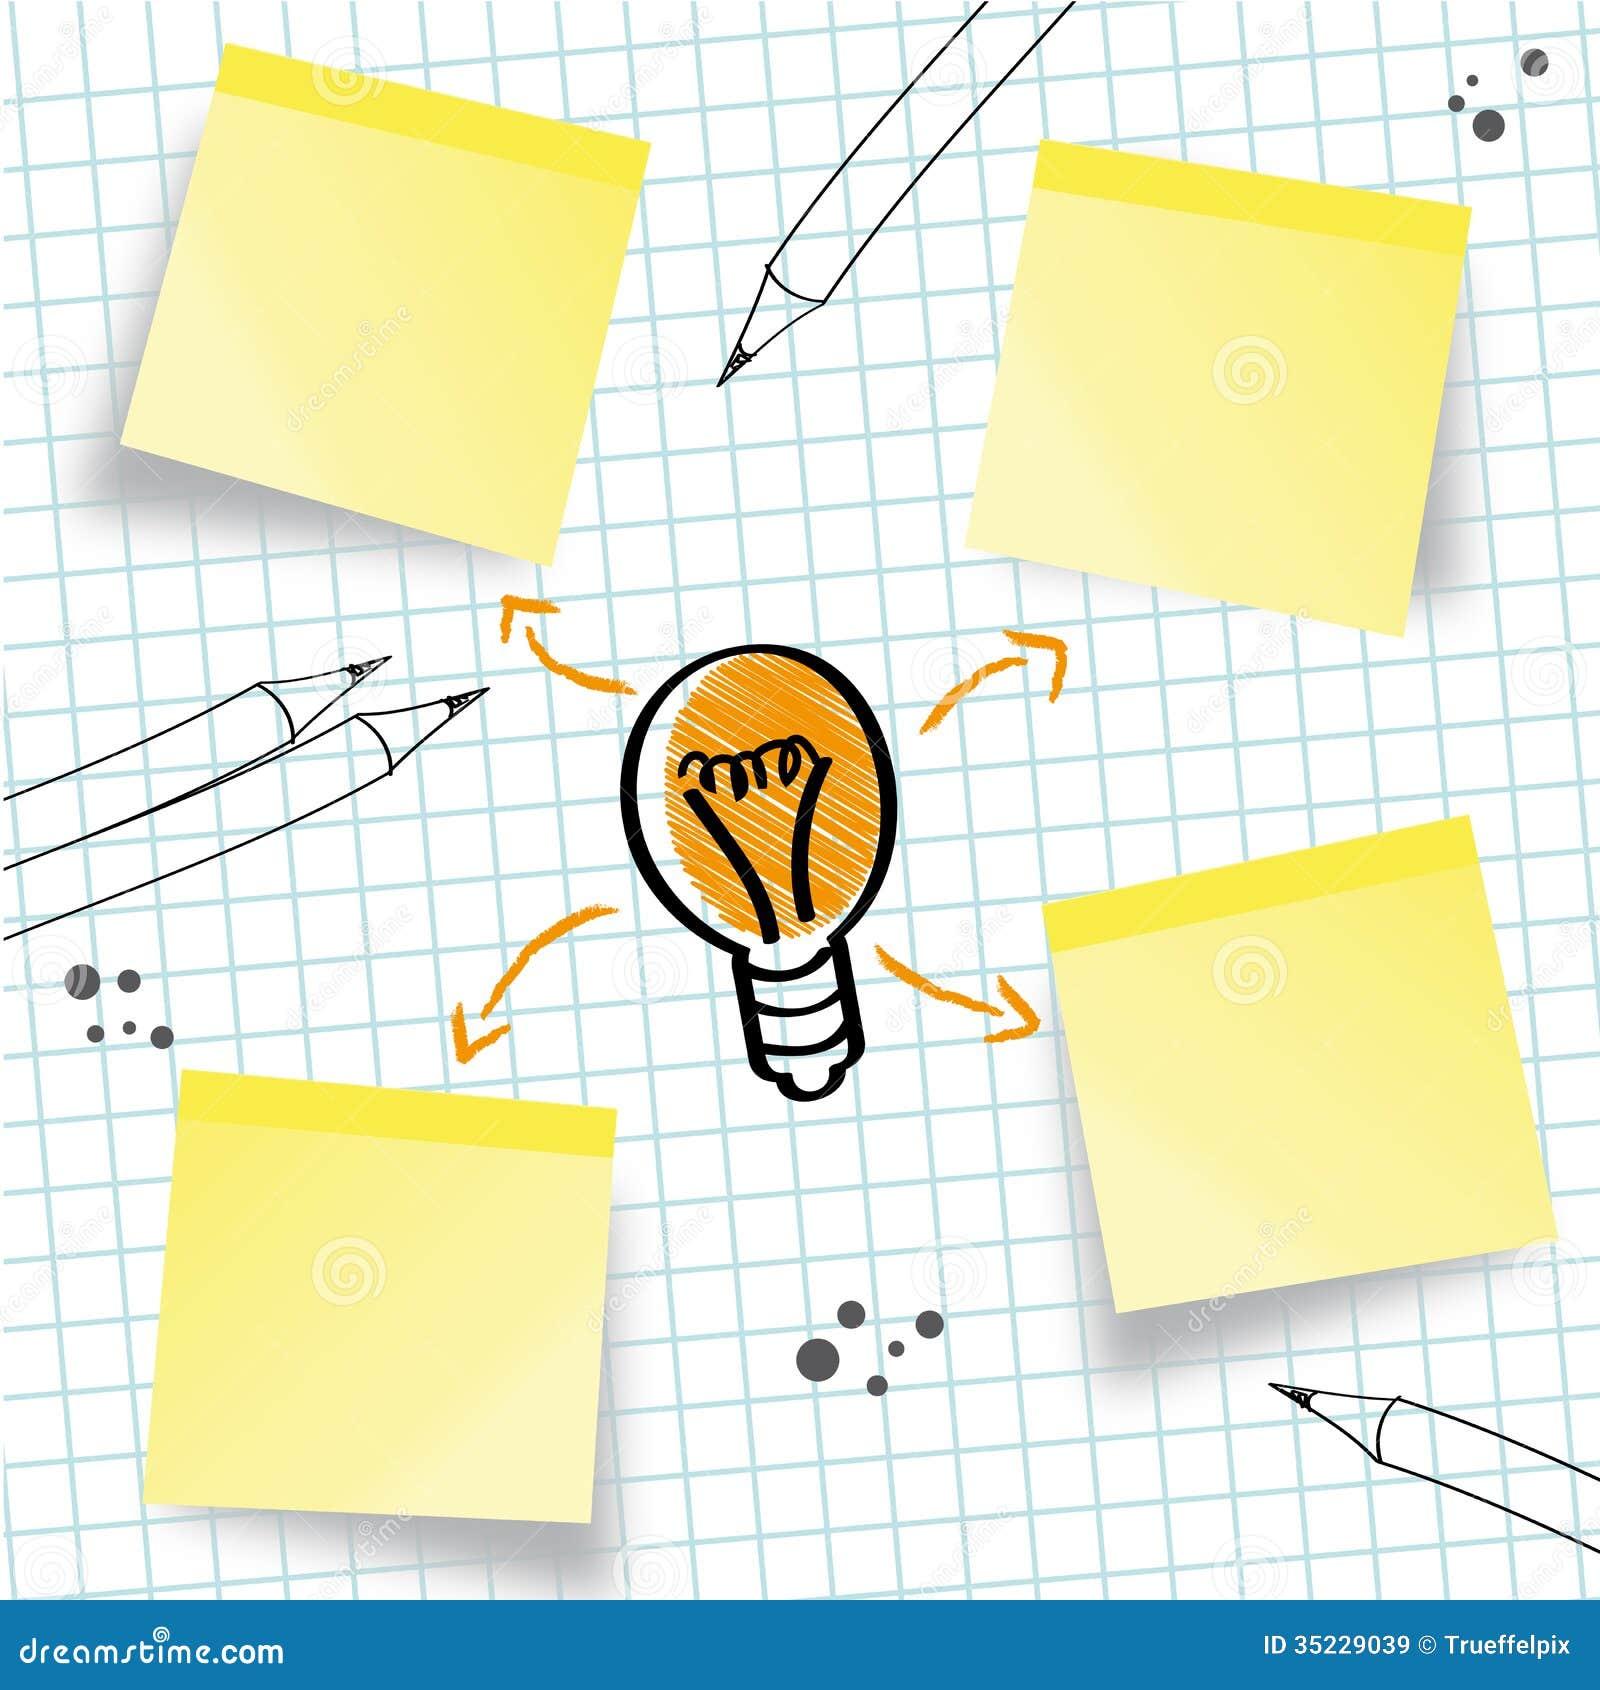 Art brainstorming ideas